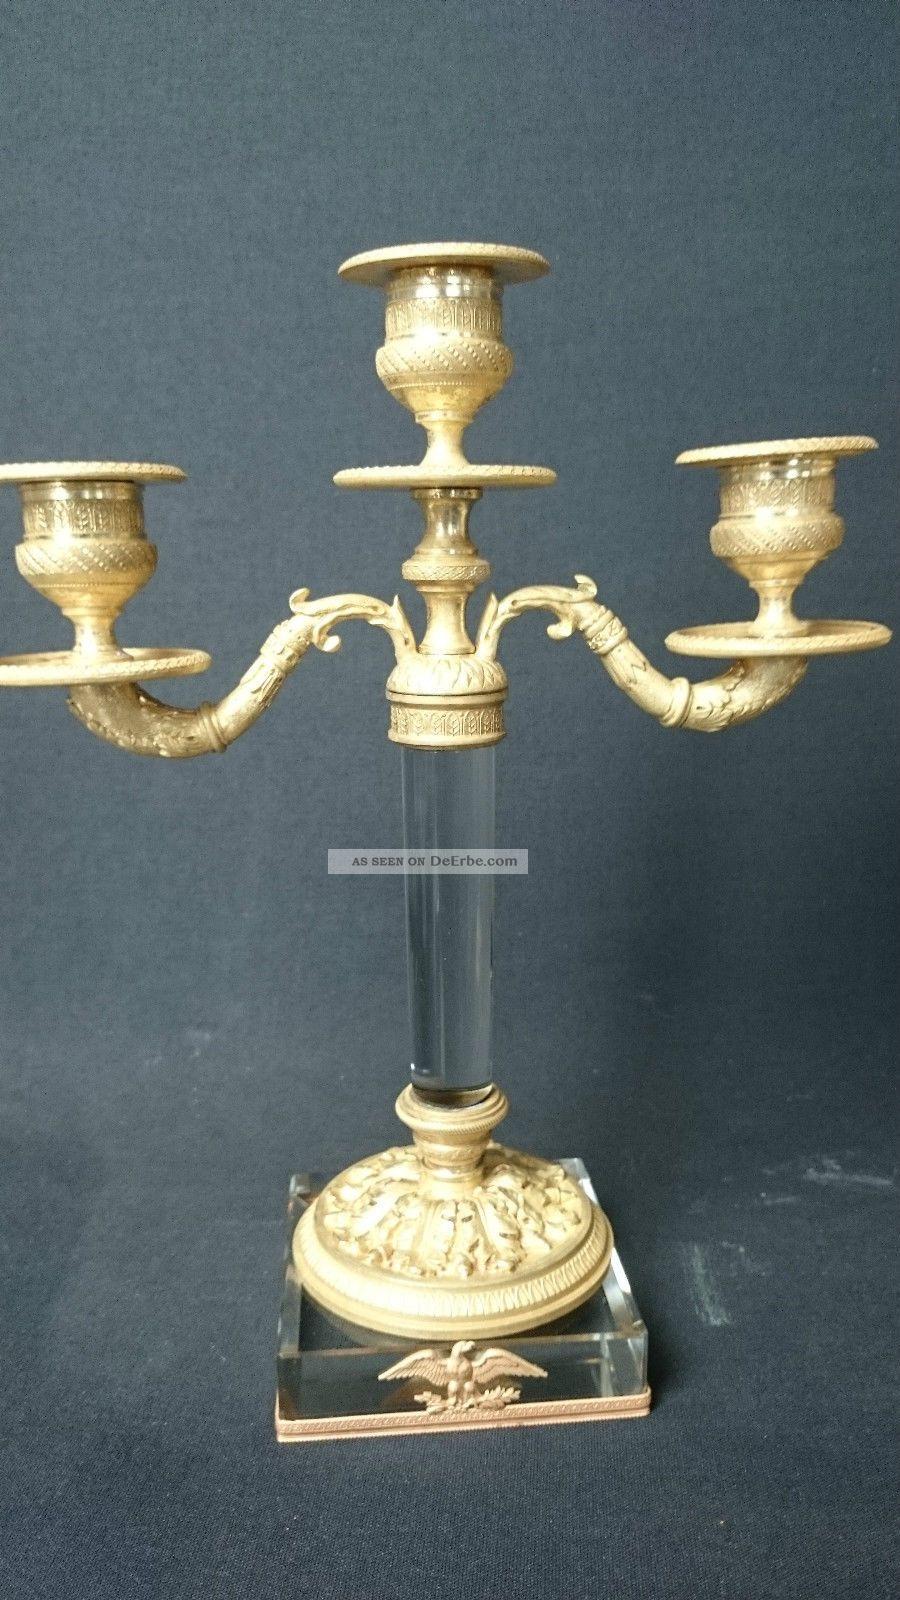 antikes paar empire stil bronze kristall kandelaber kerzenleuchter um 1870. Black Bedroom Furniture Sets. Home Design Ideas